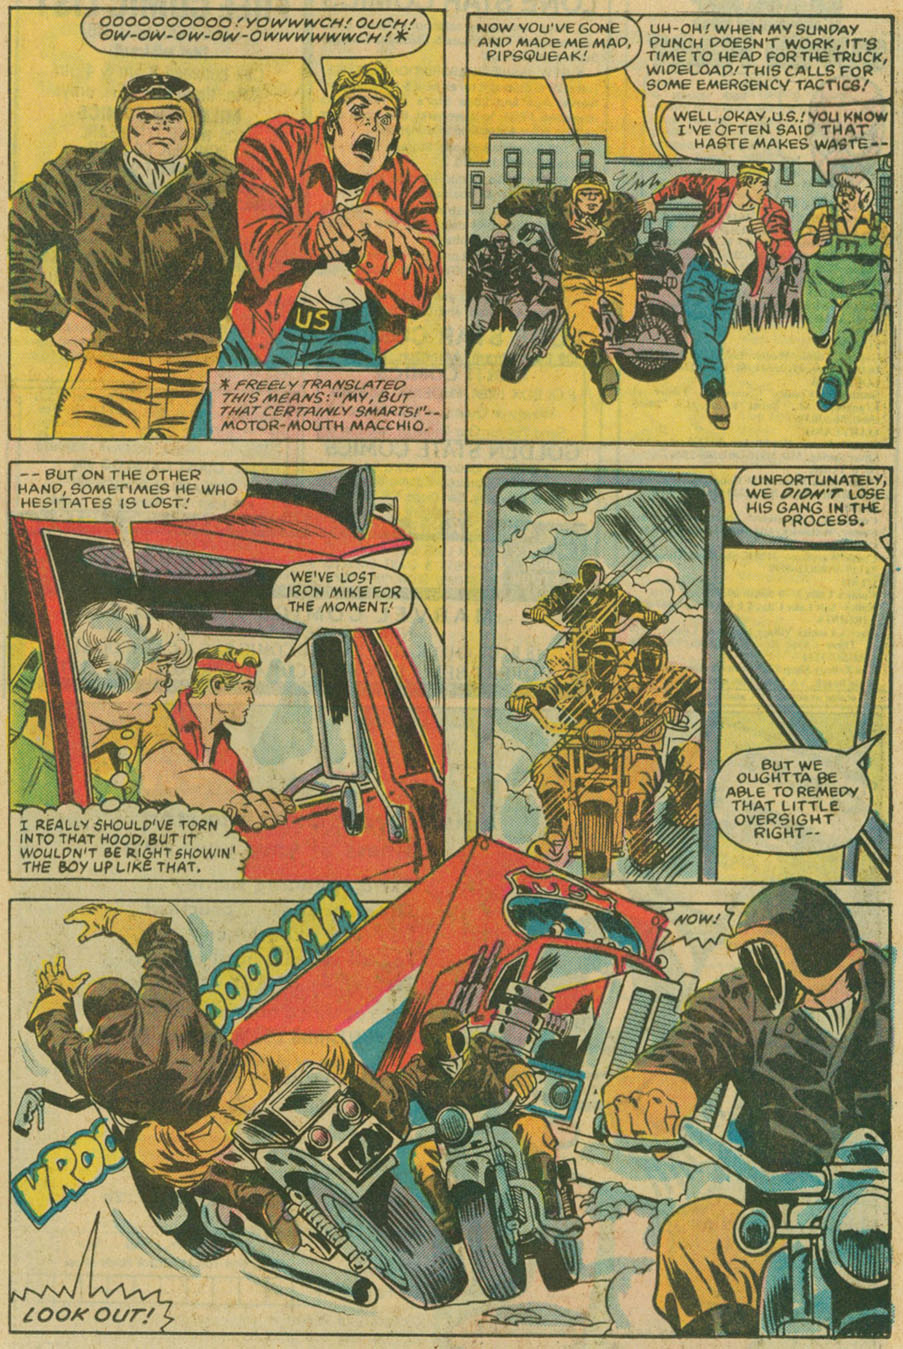 Read online U.S. 1 comic -  Issue #6 - 16